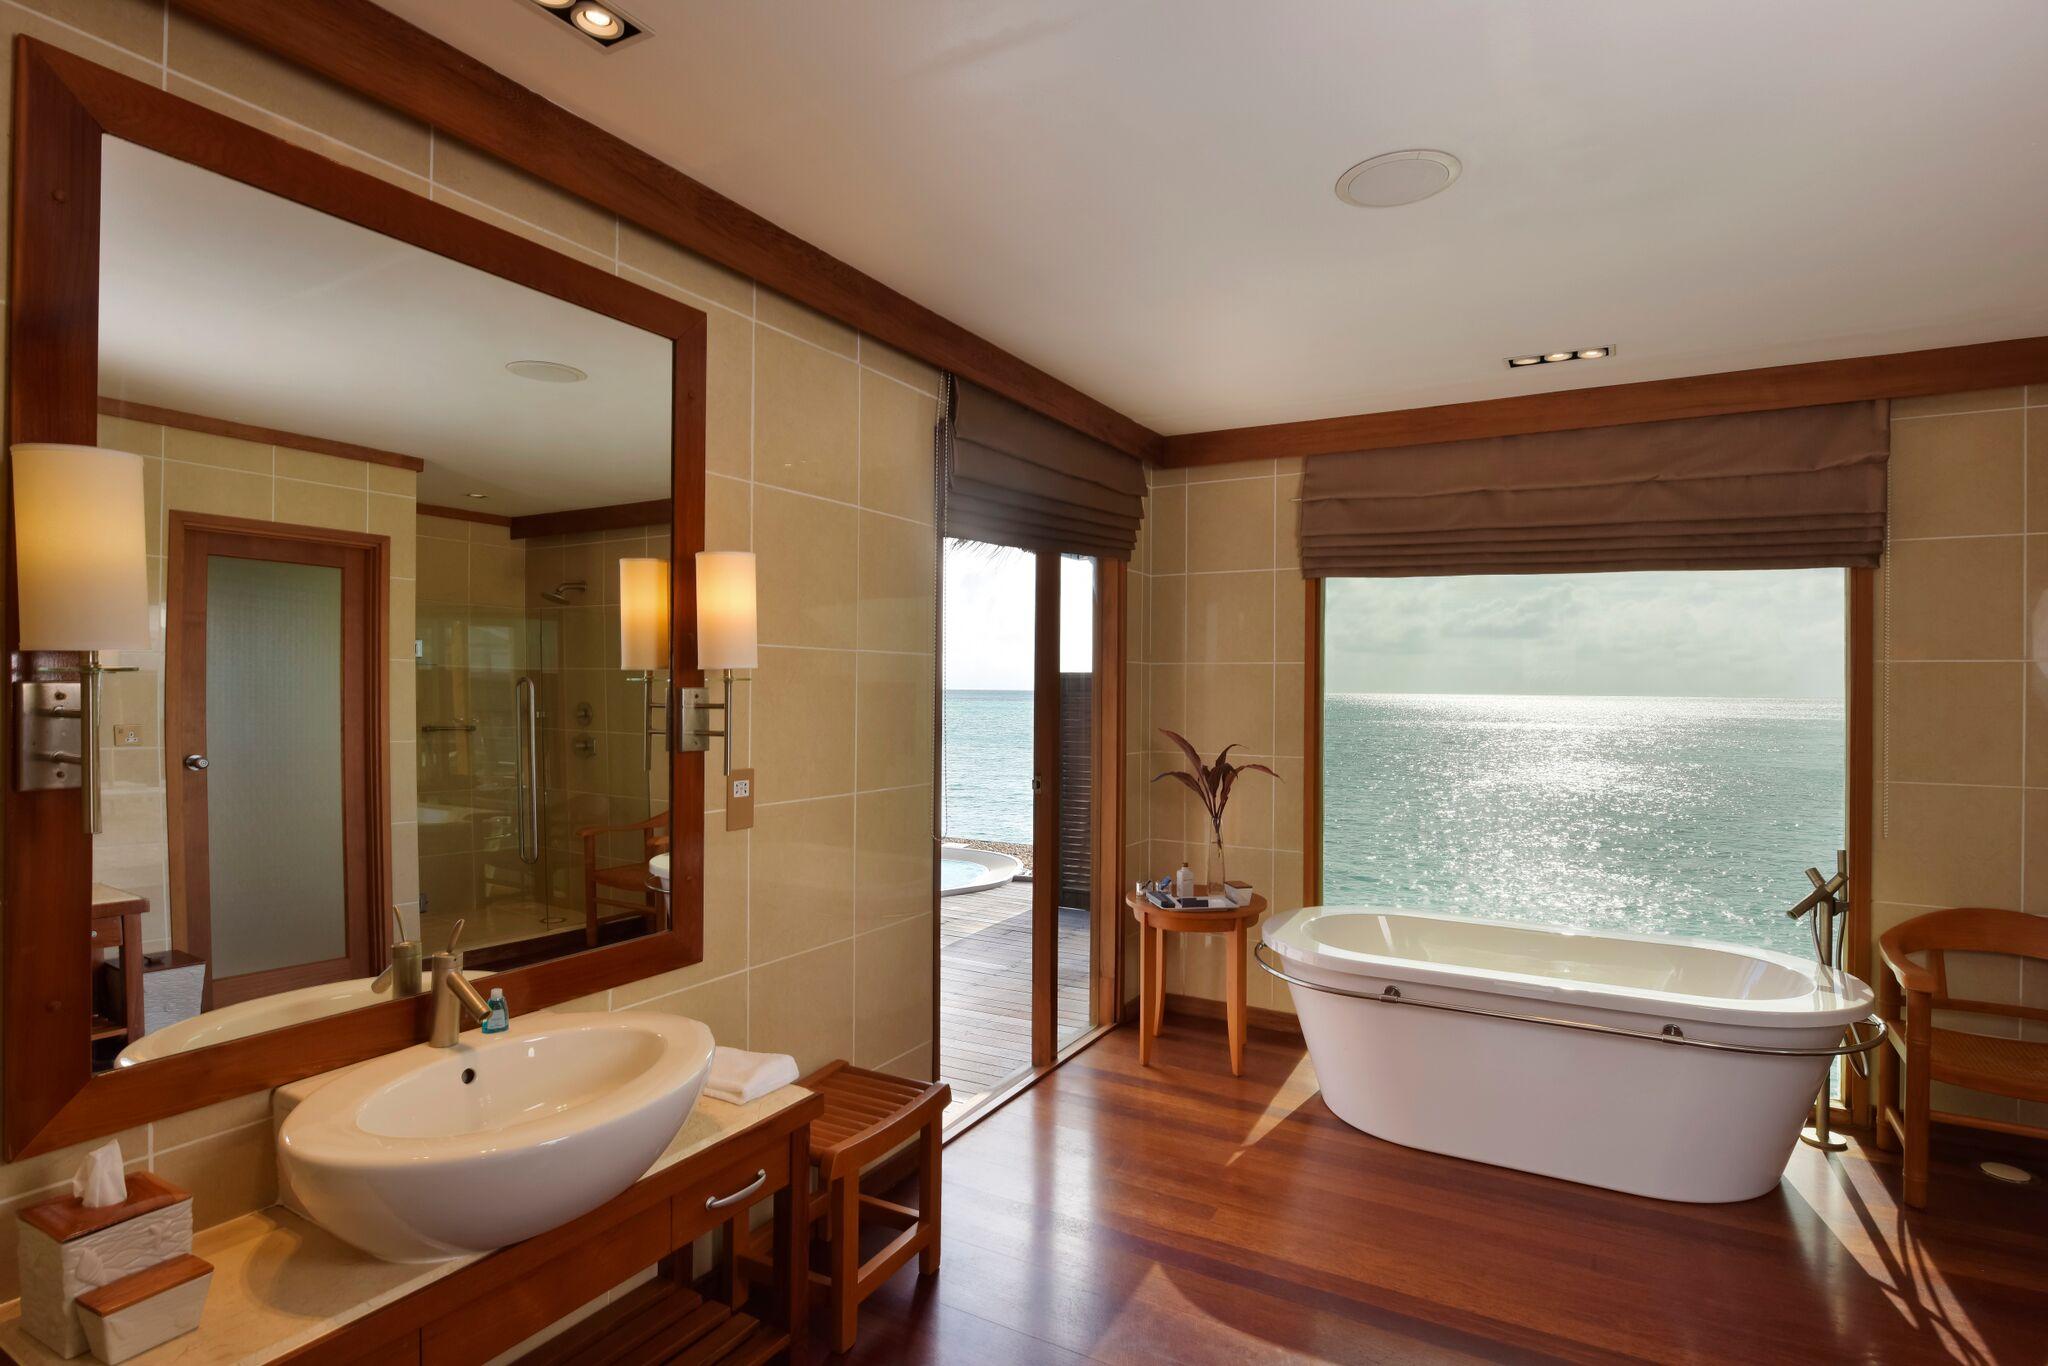 CMRI_Deluxe Water Villa_Bathroom (a)_preview.jpeg